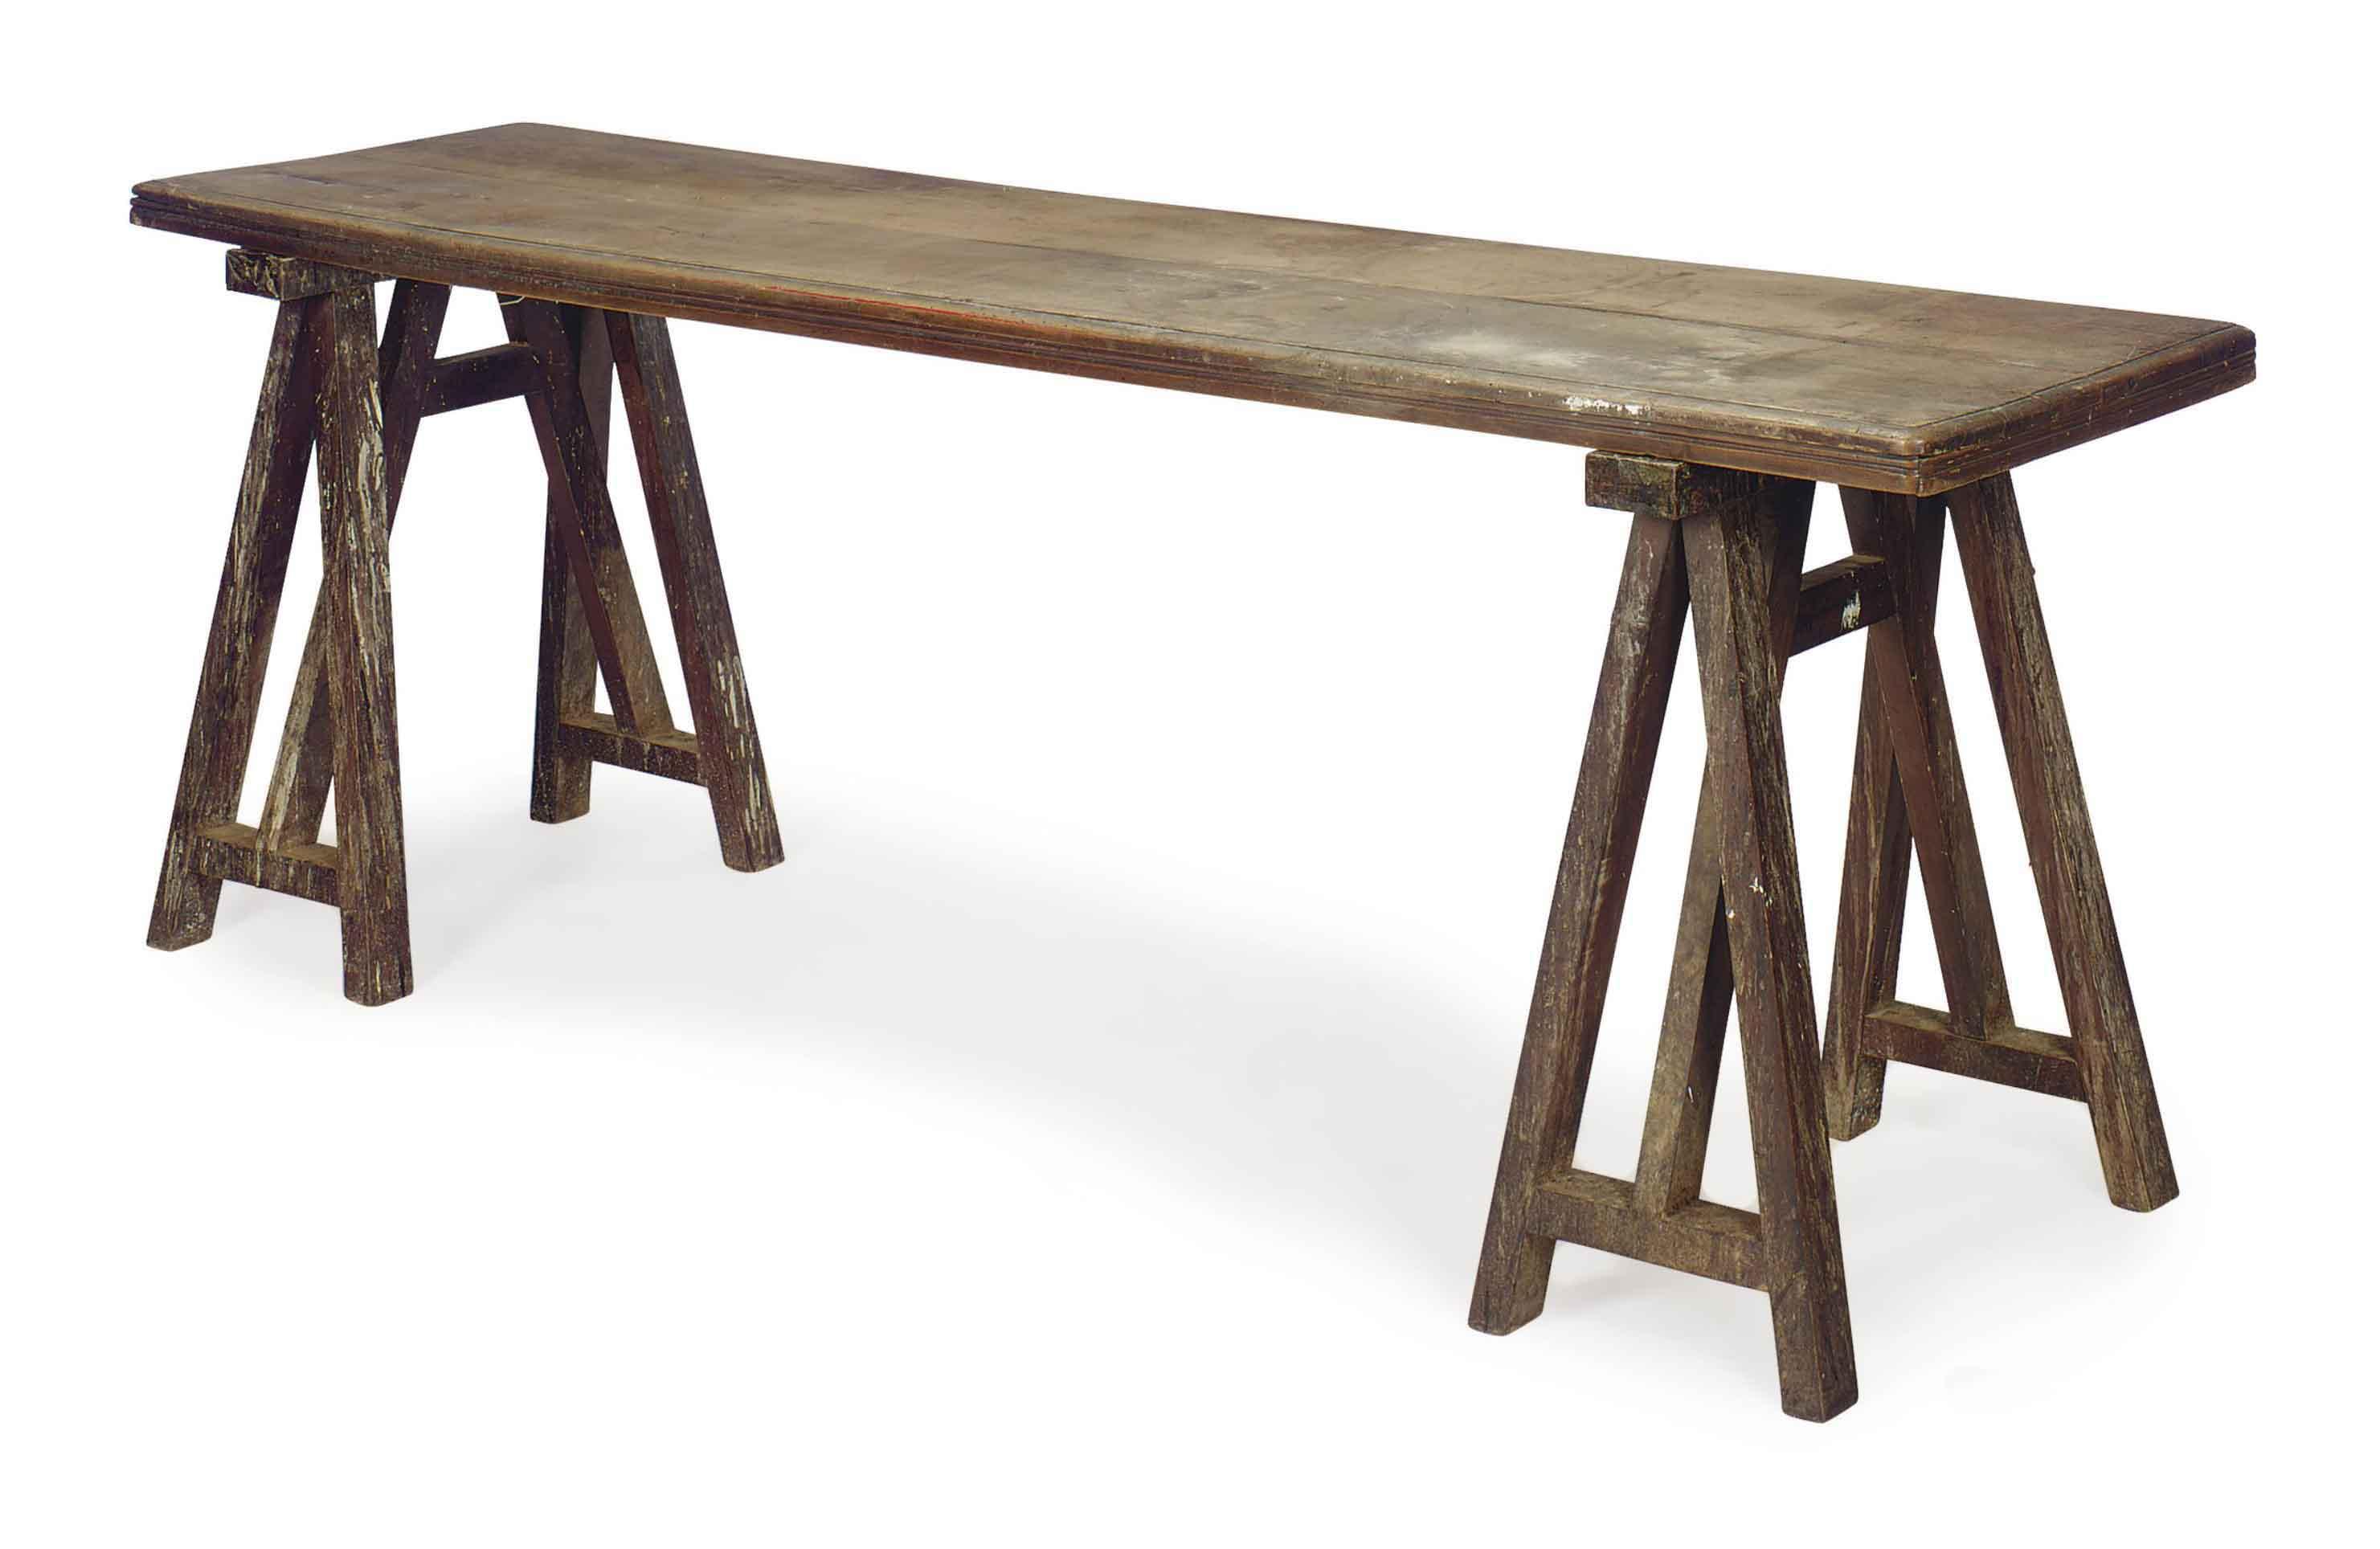 AN ITALIAN WALNUT TRESTLE BASE REFECTORY TABLE,